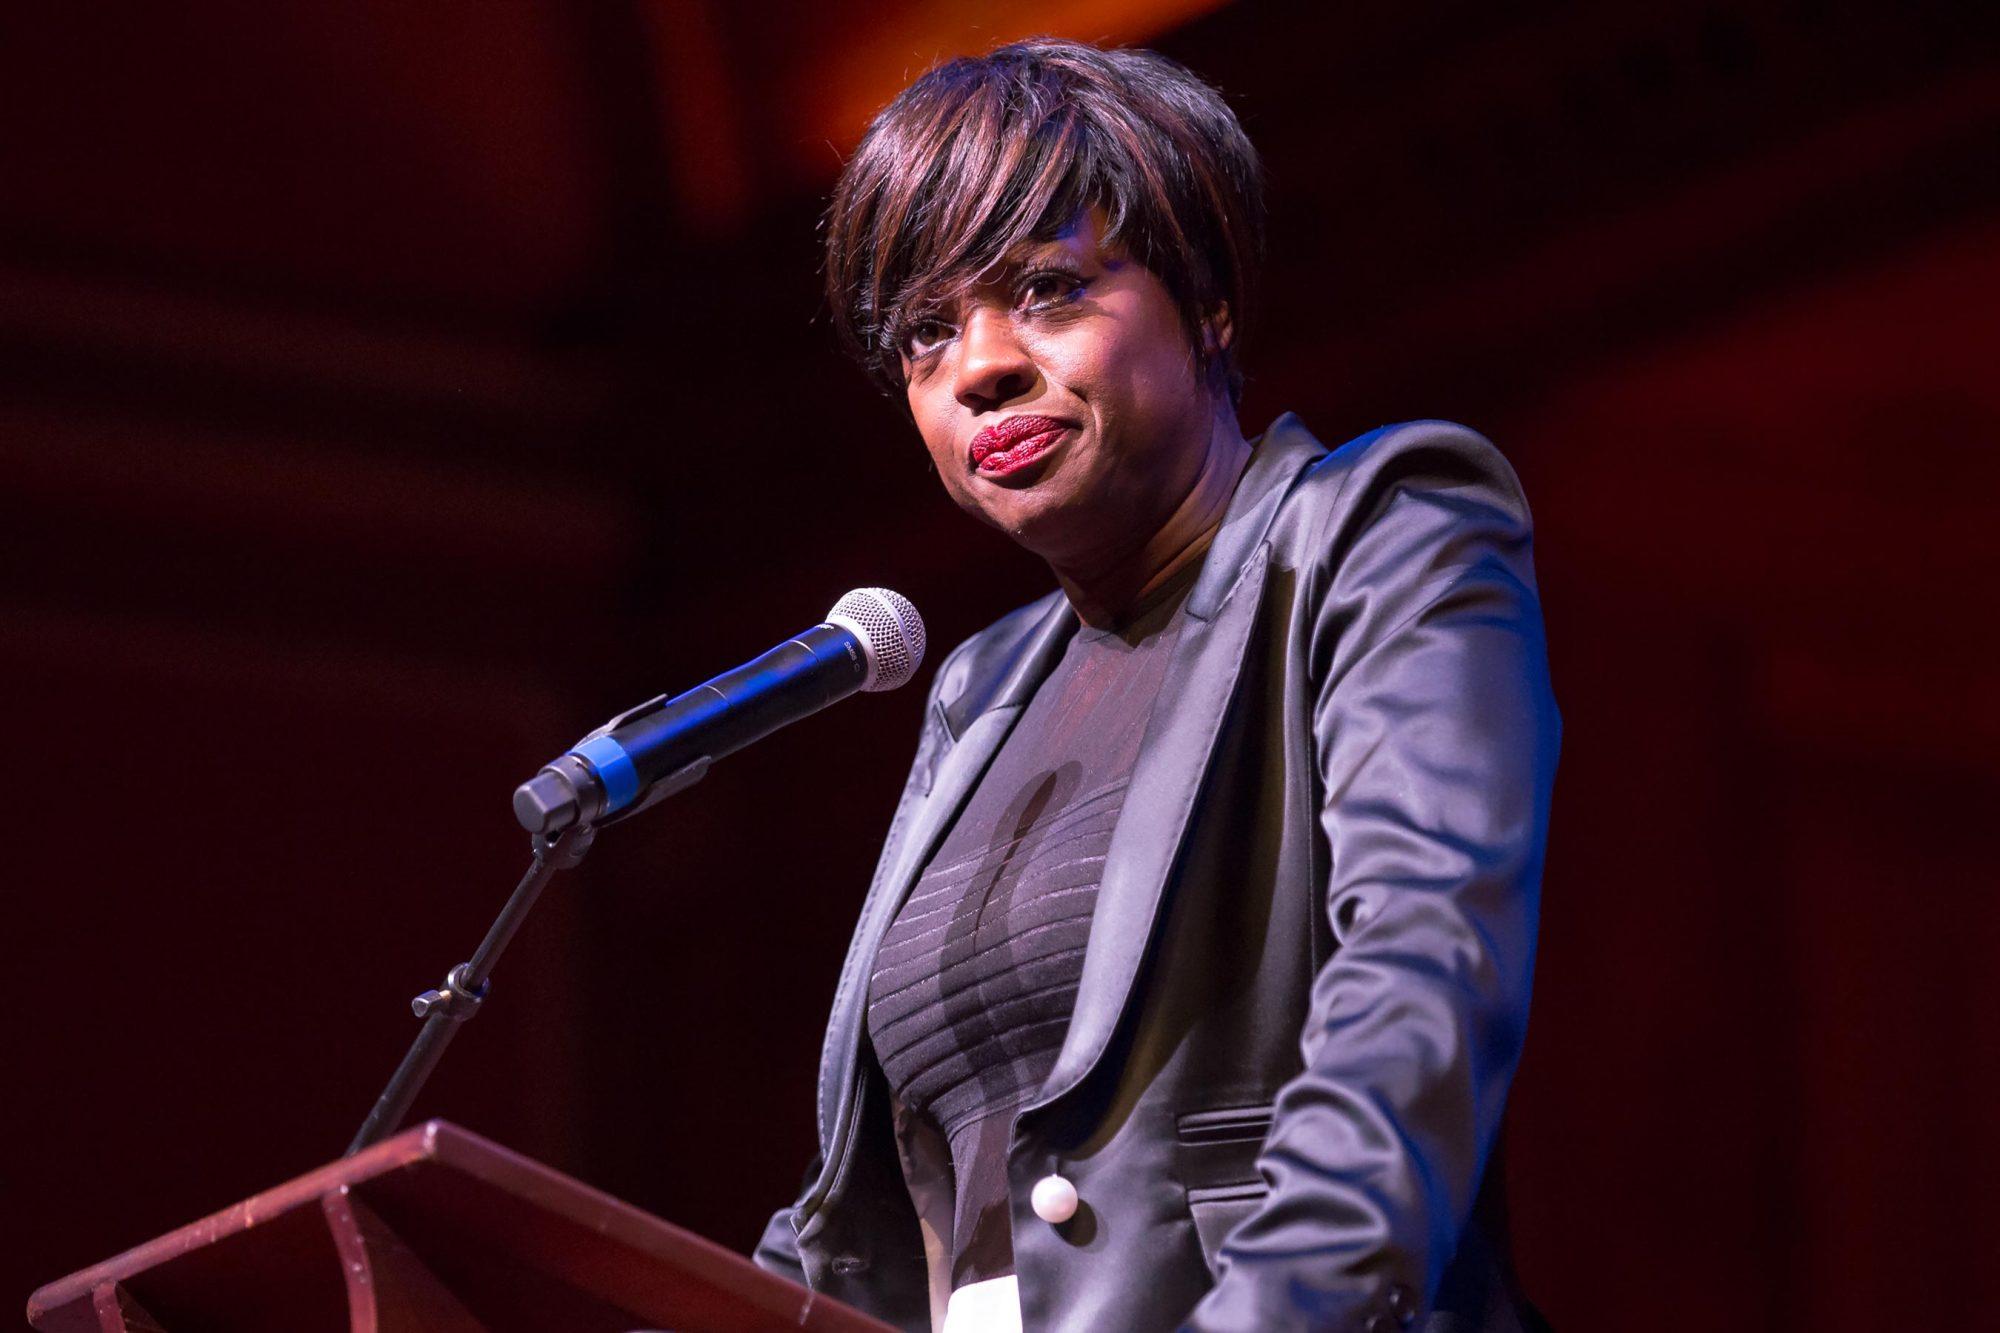 Viola Davis Awarded Harvard Foundation's 2017 Artist Of The Year